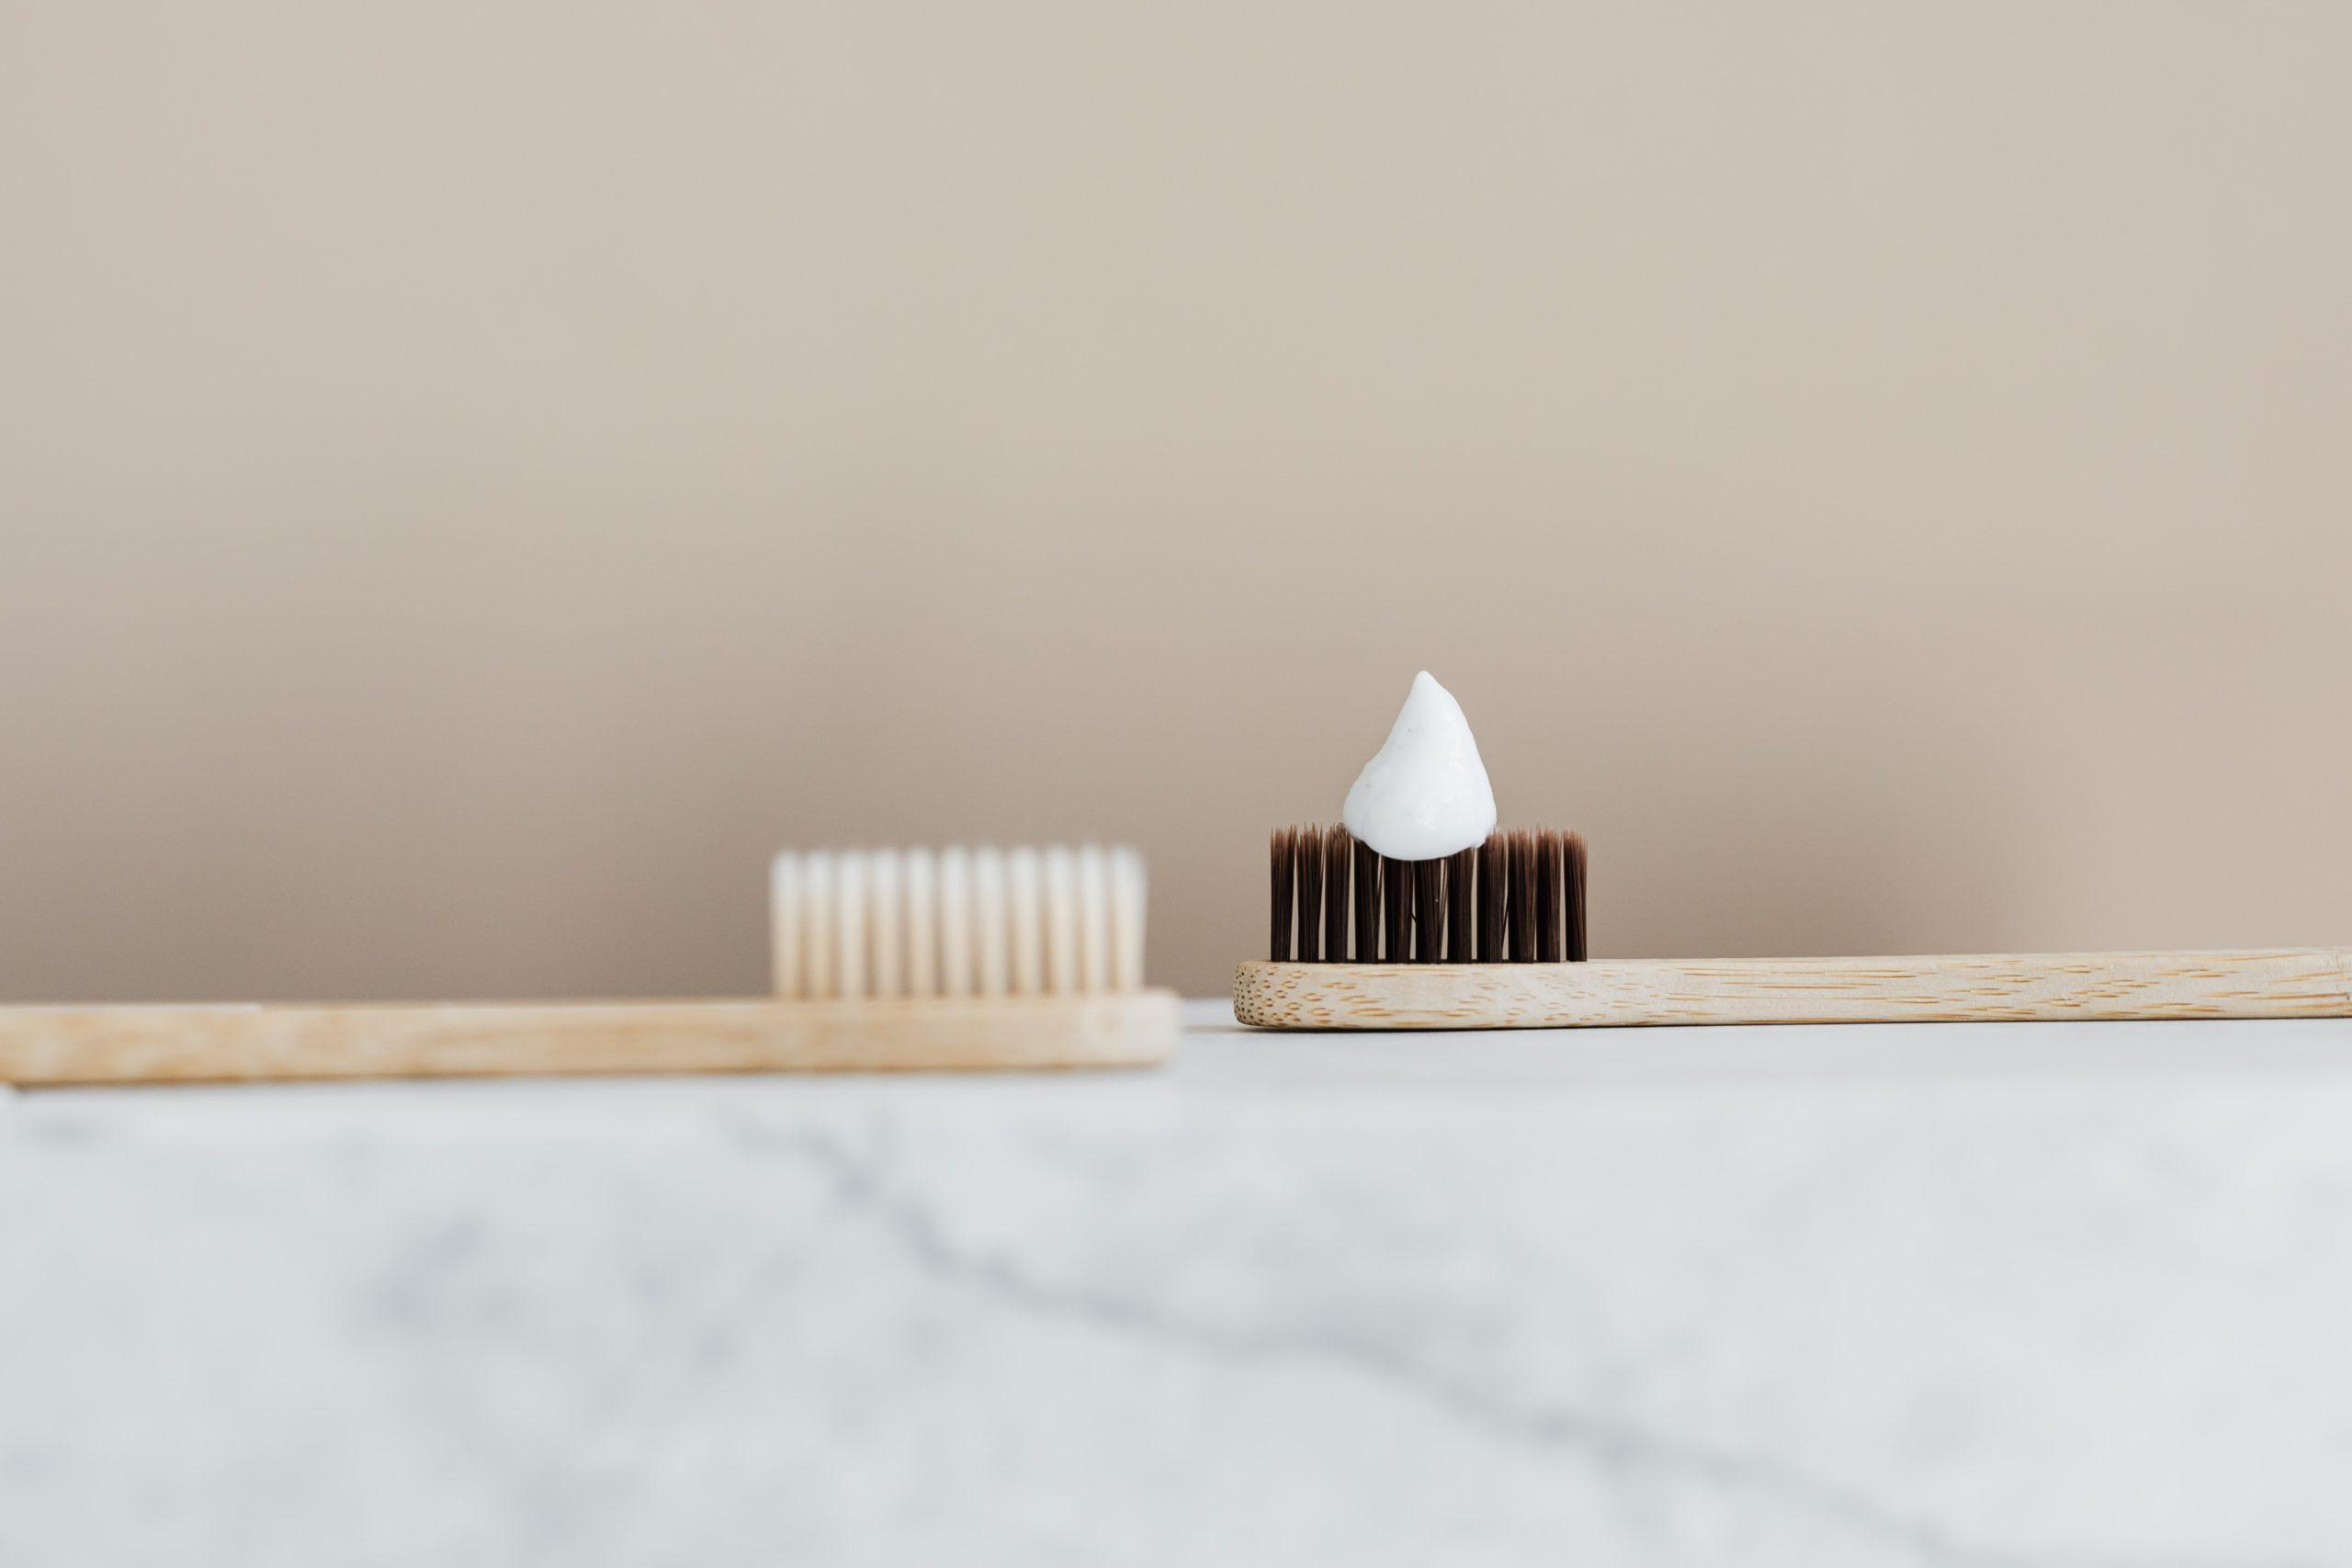 hard or soft toothbrush